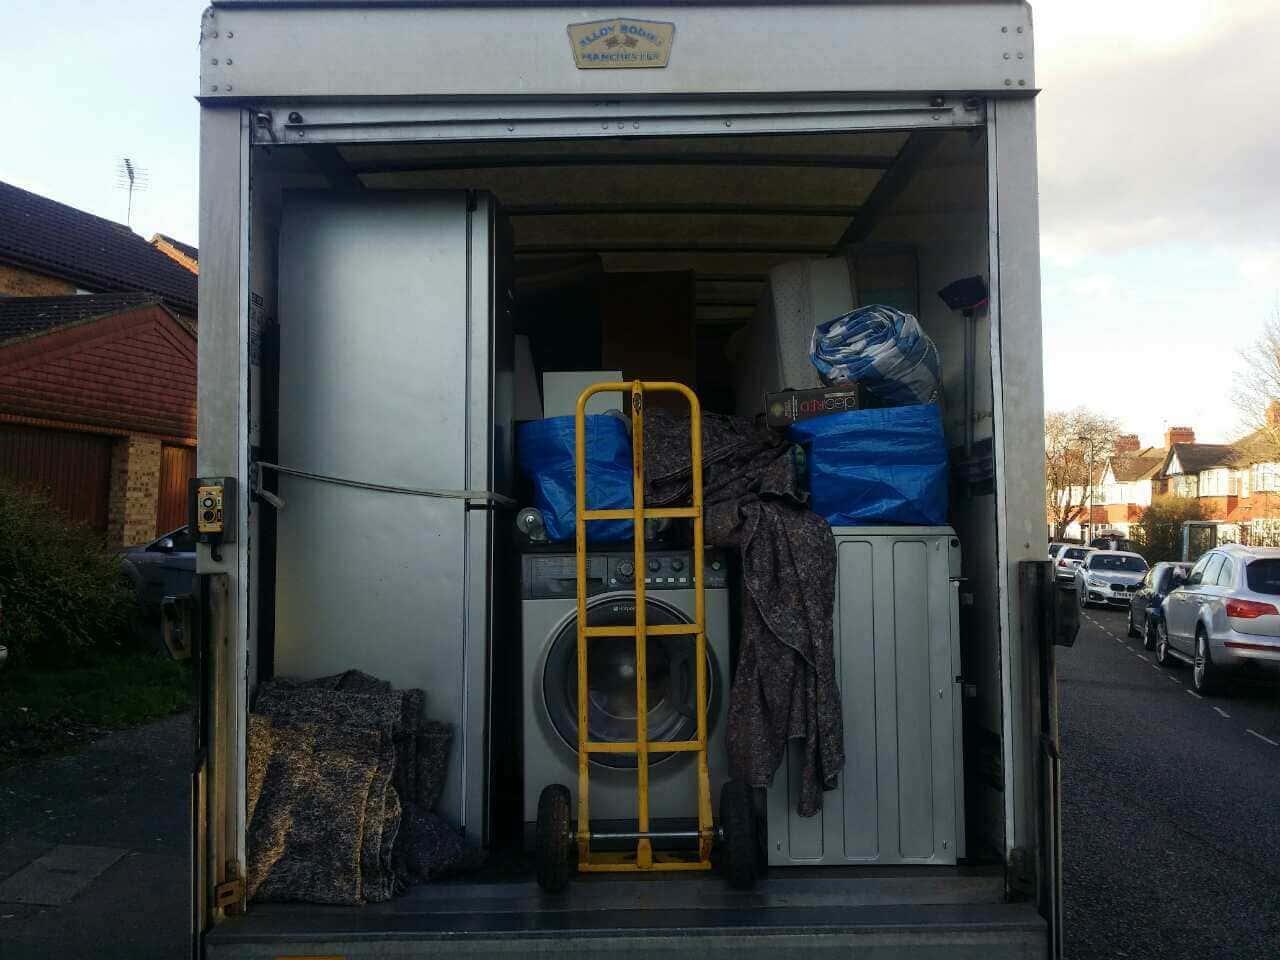 AL3 van for hire in St Albans